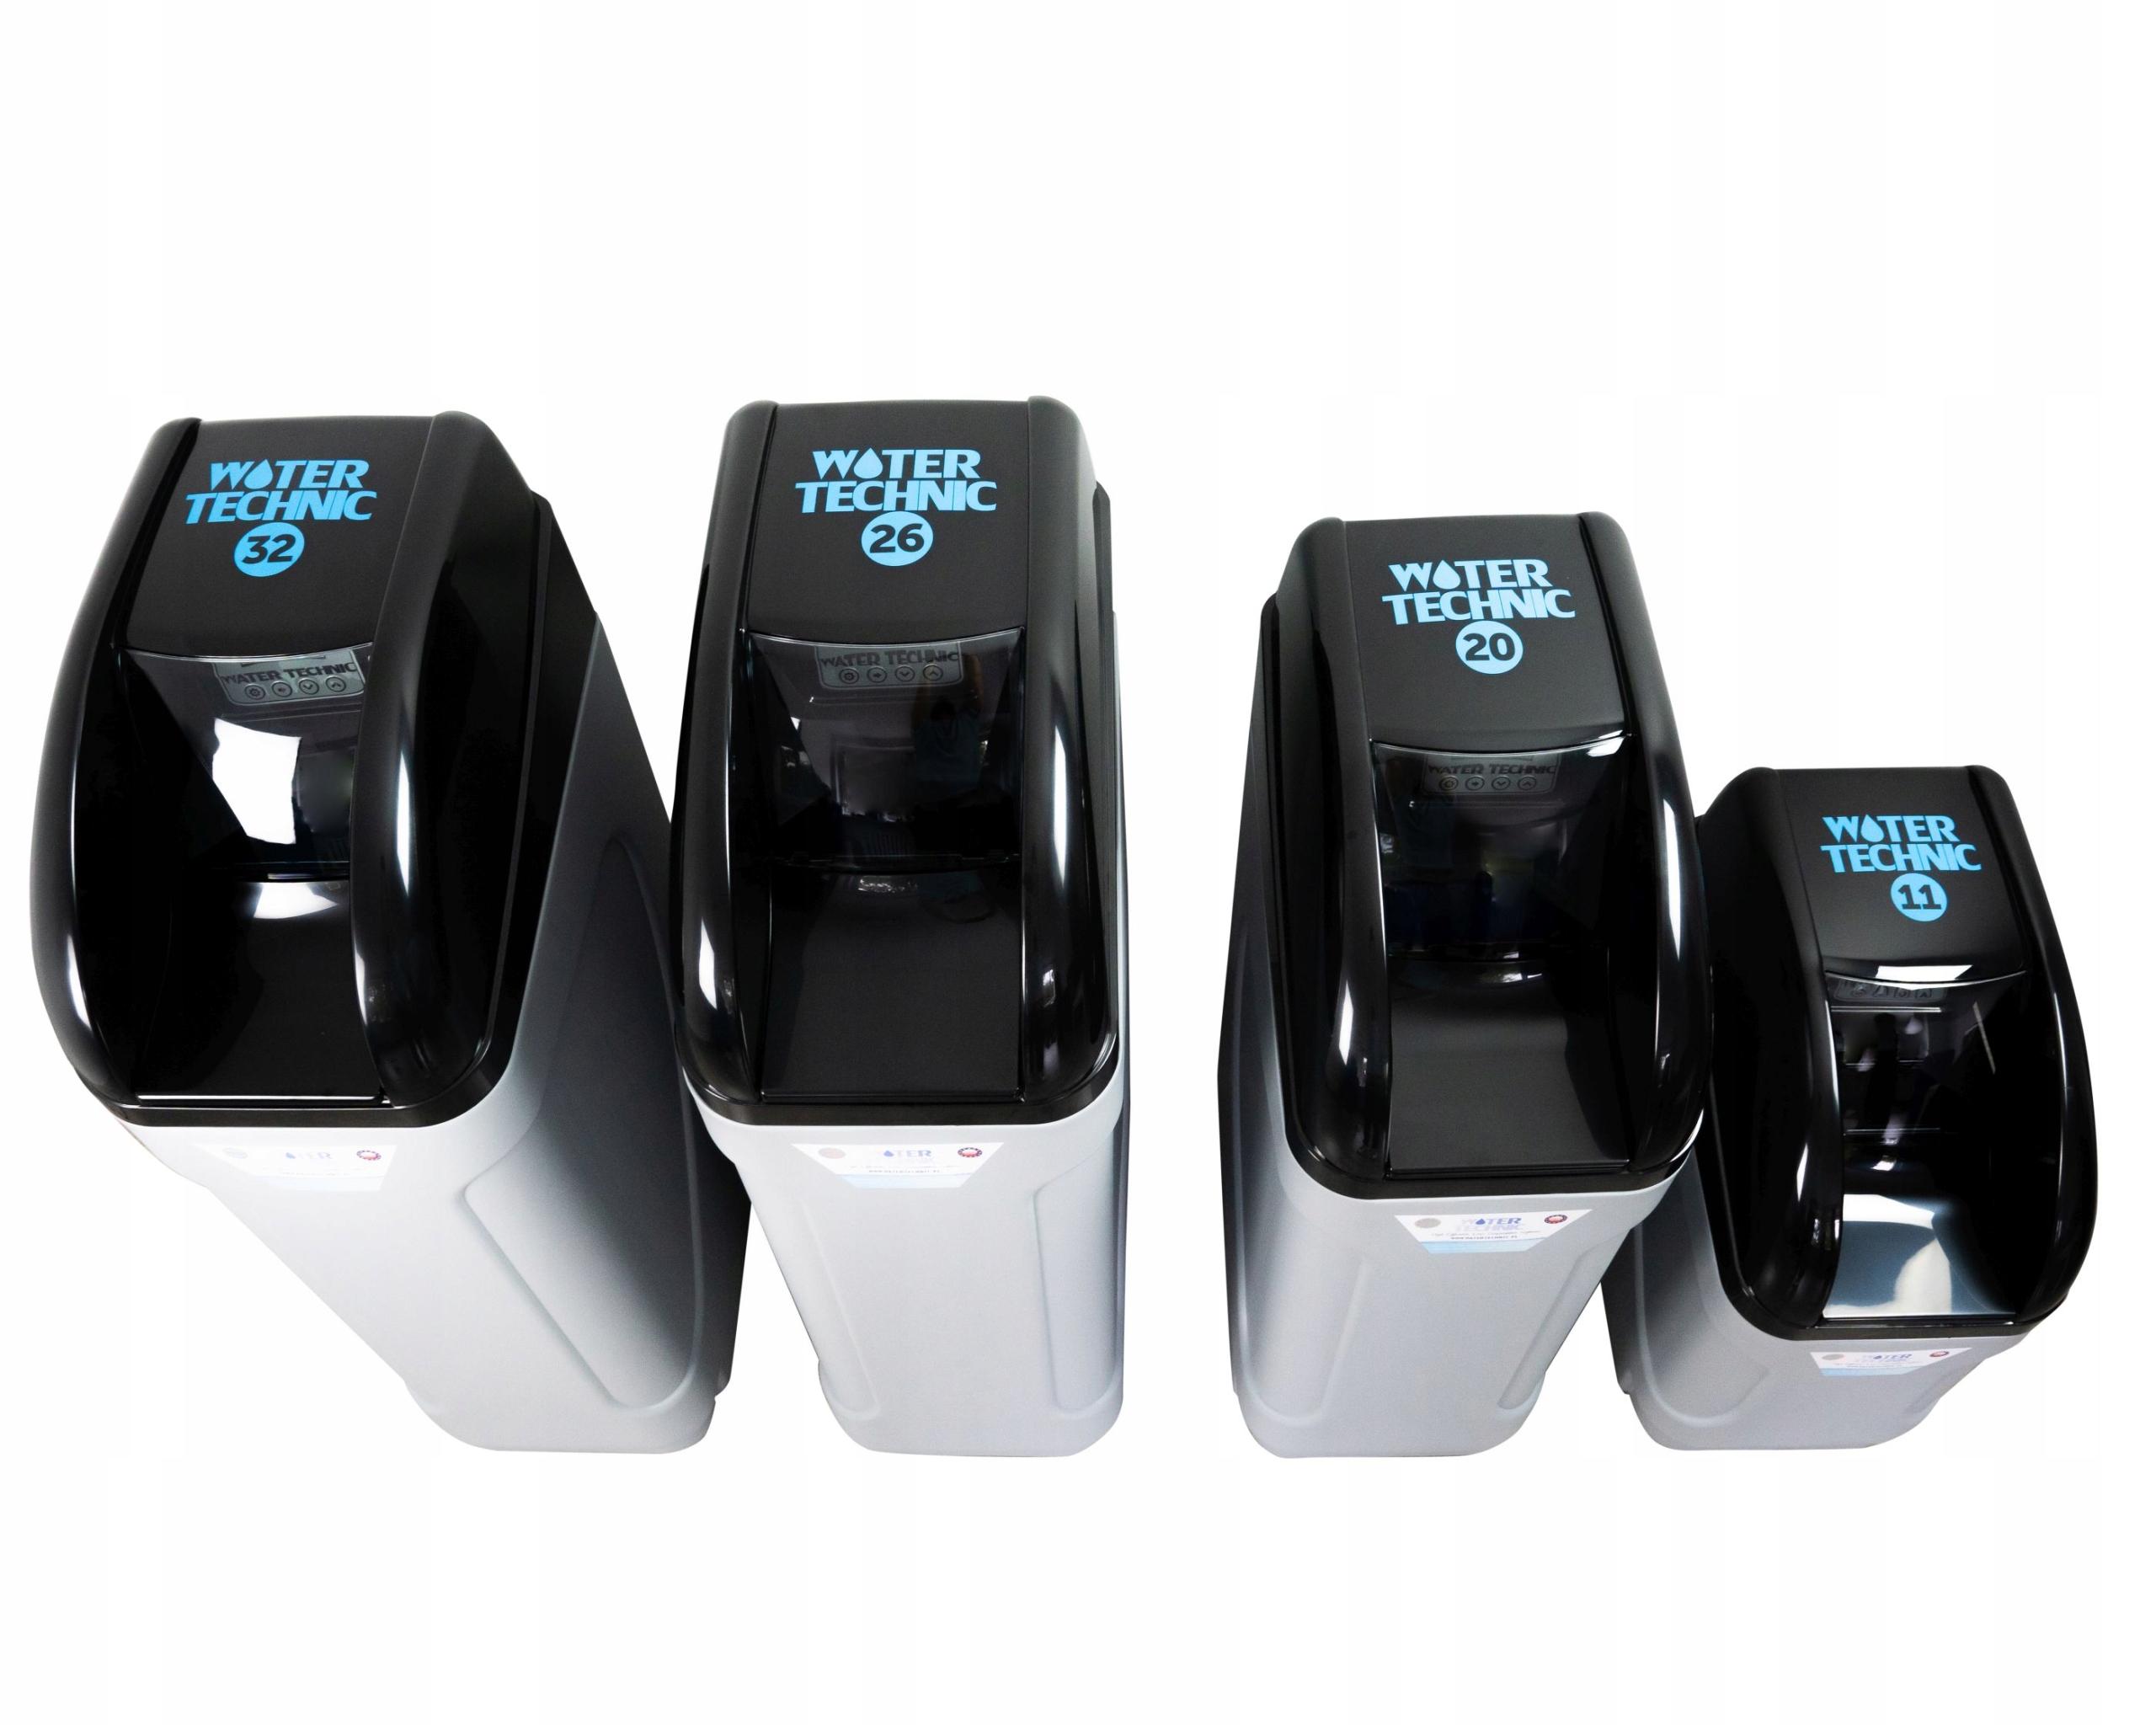 ZMIĘKCZACZ WODY WATER TECHNIC 32 +GENERATOR CHLORU Marka Water Technic